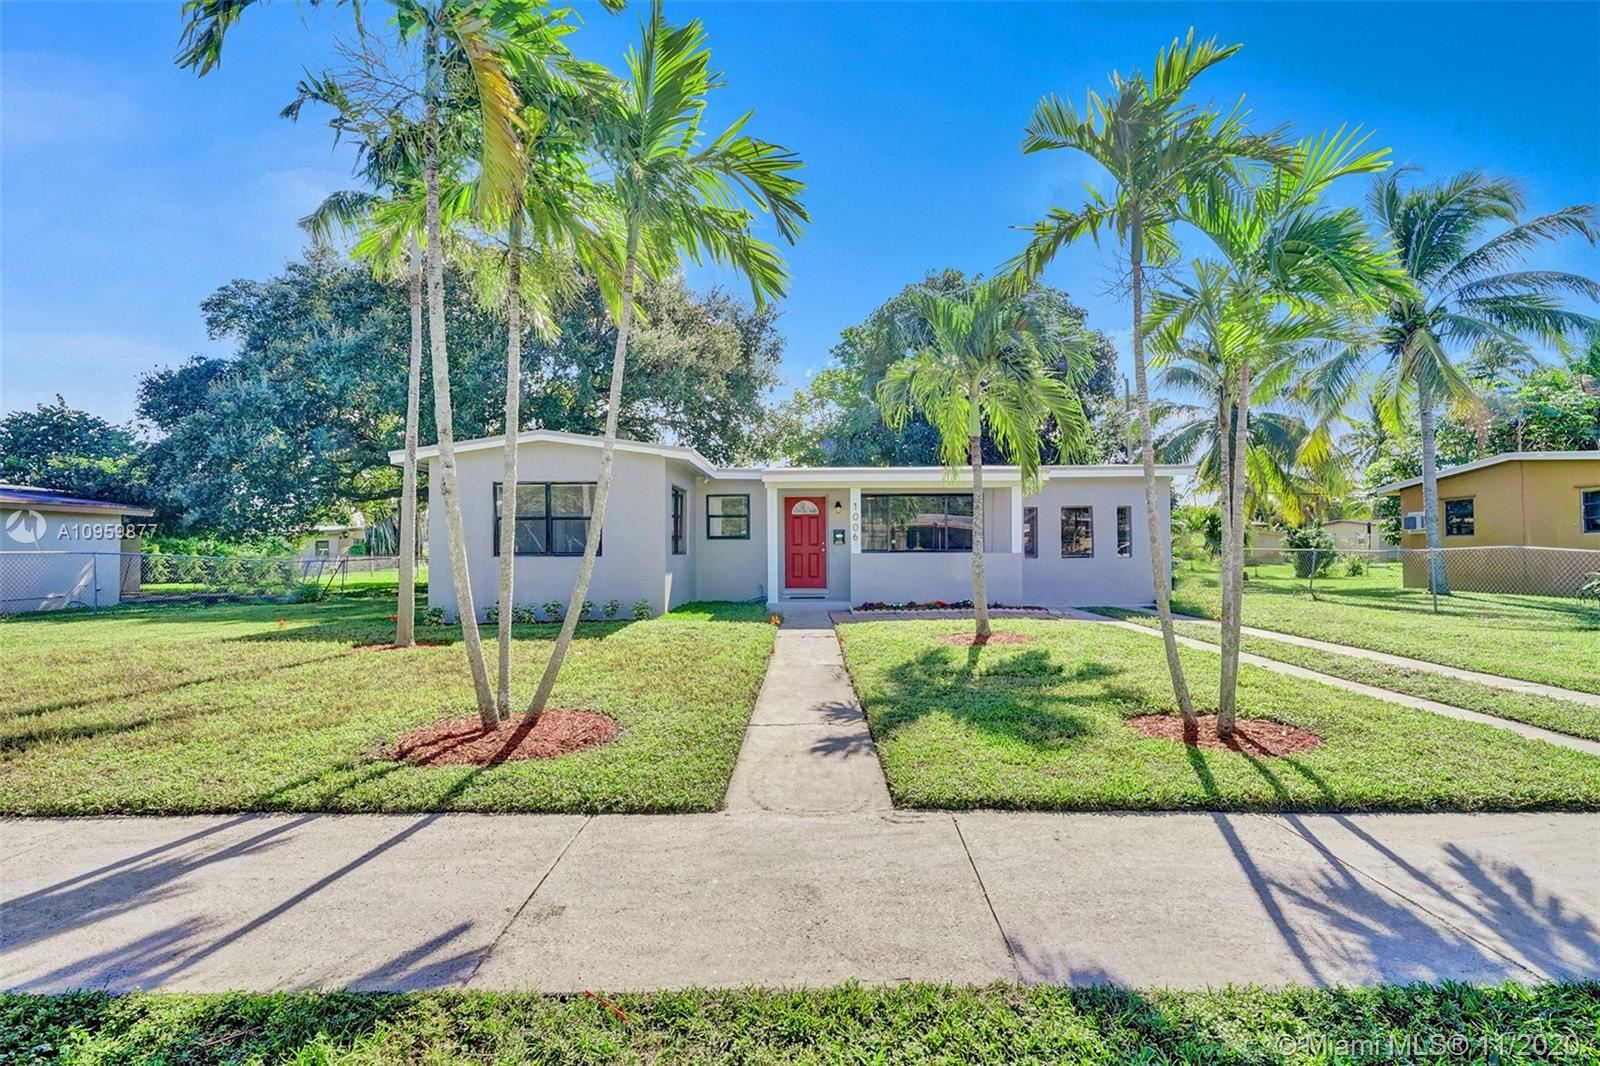 Fort Lauderdale, FL 33311